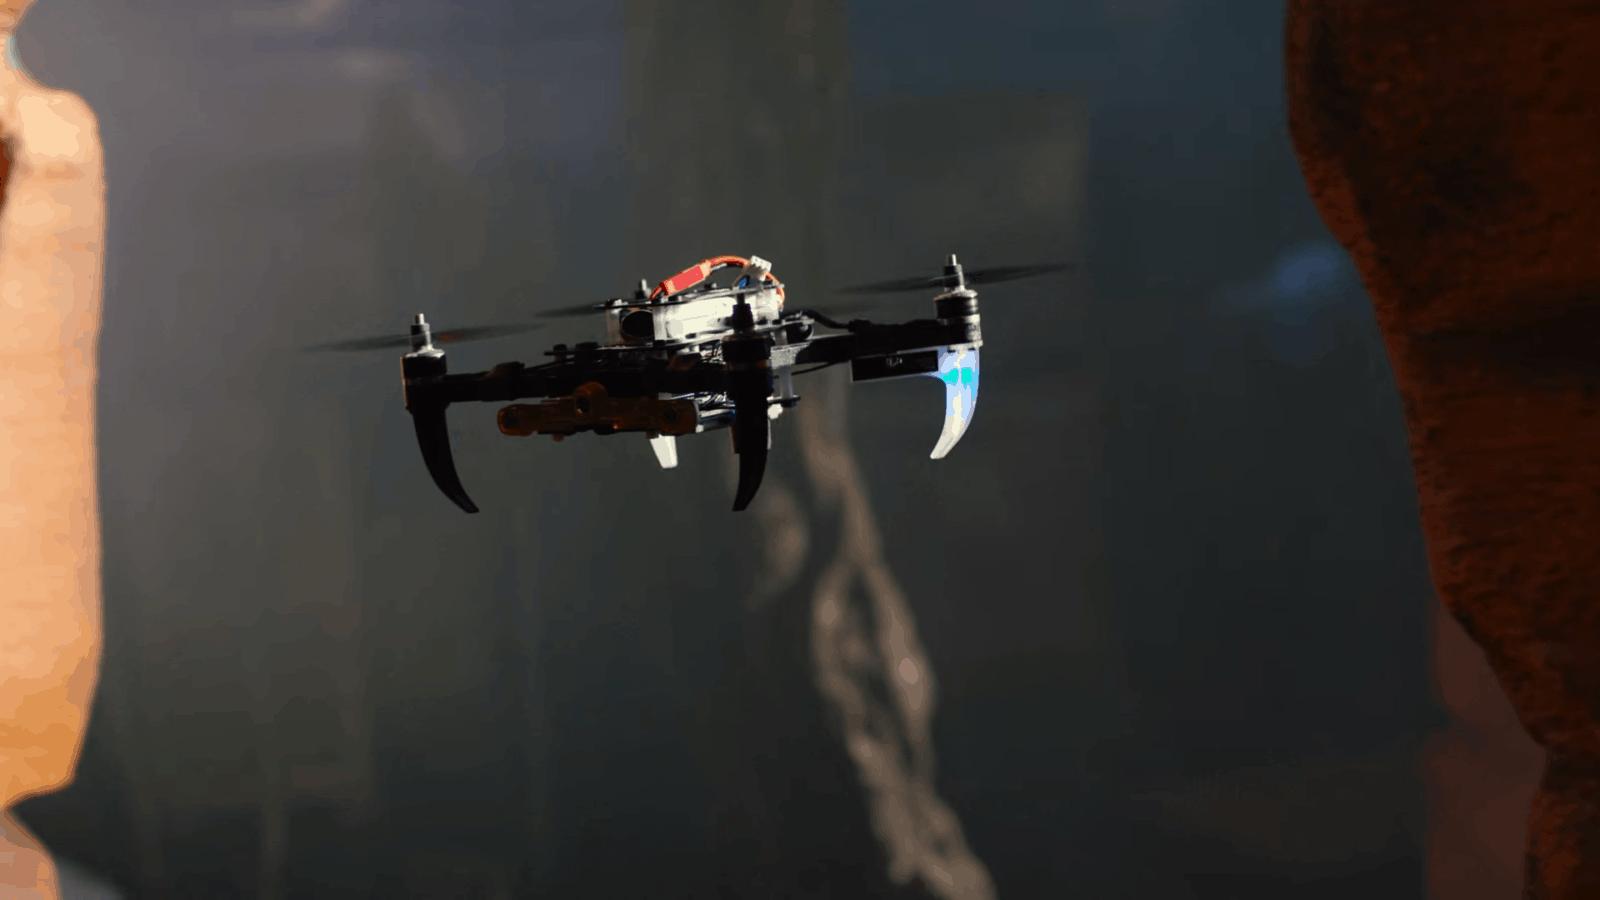 Qualcomm Snapdragon Flight Drone Demo Video